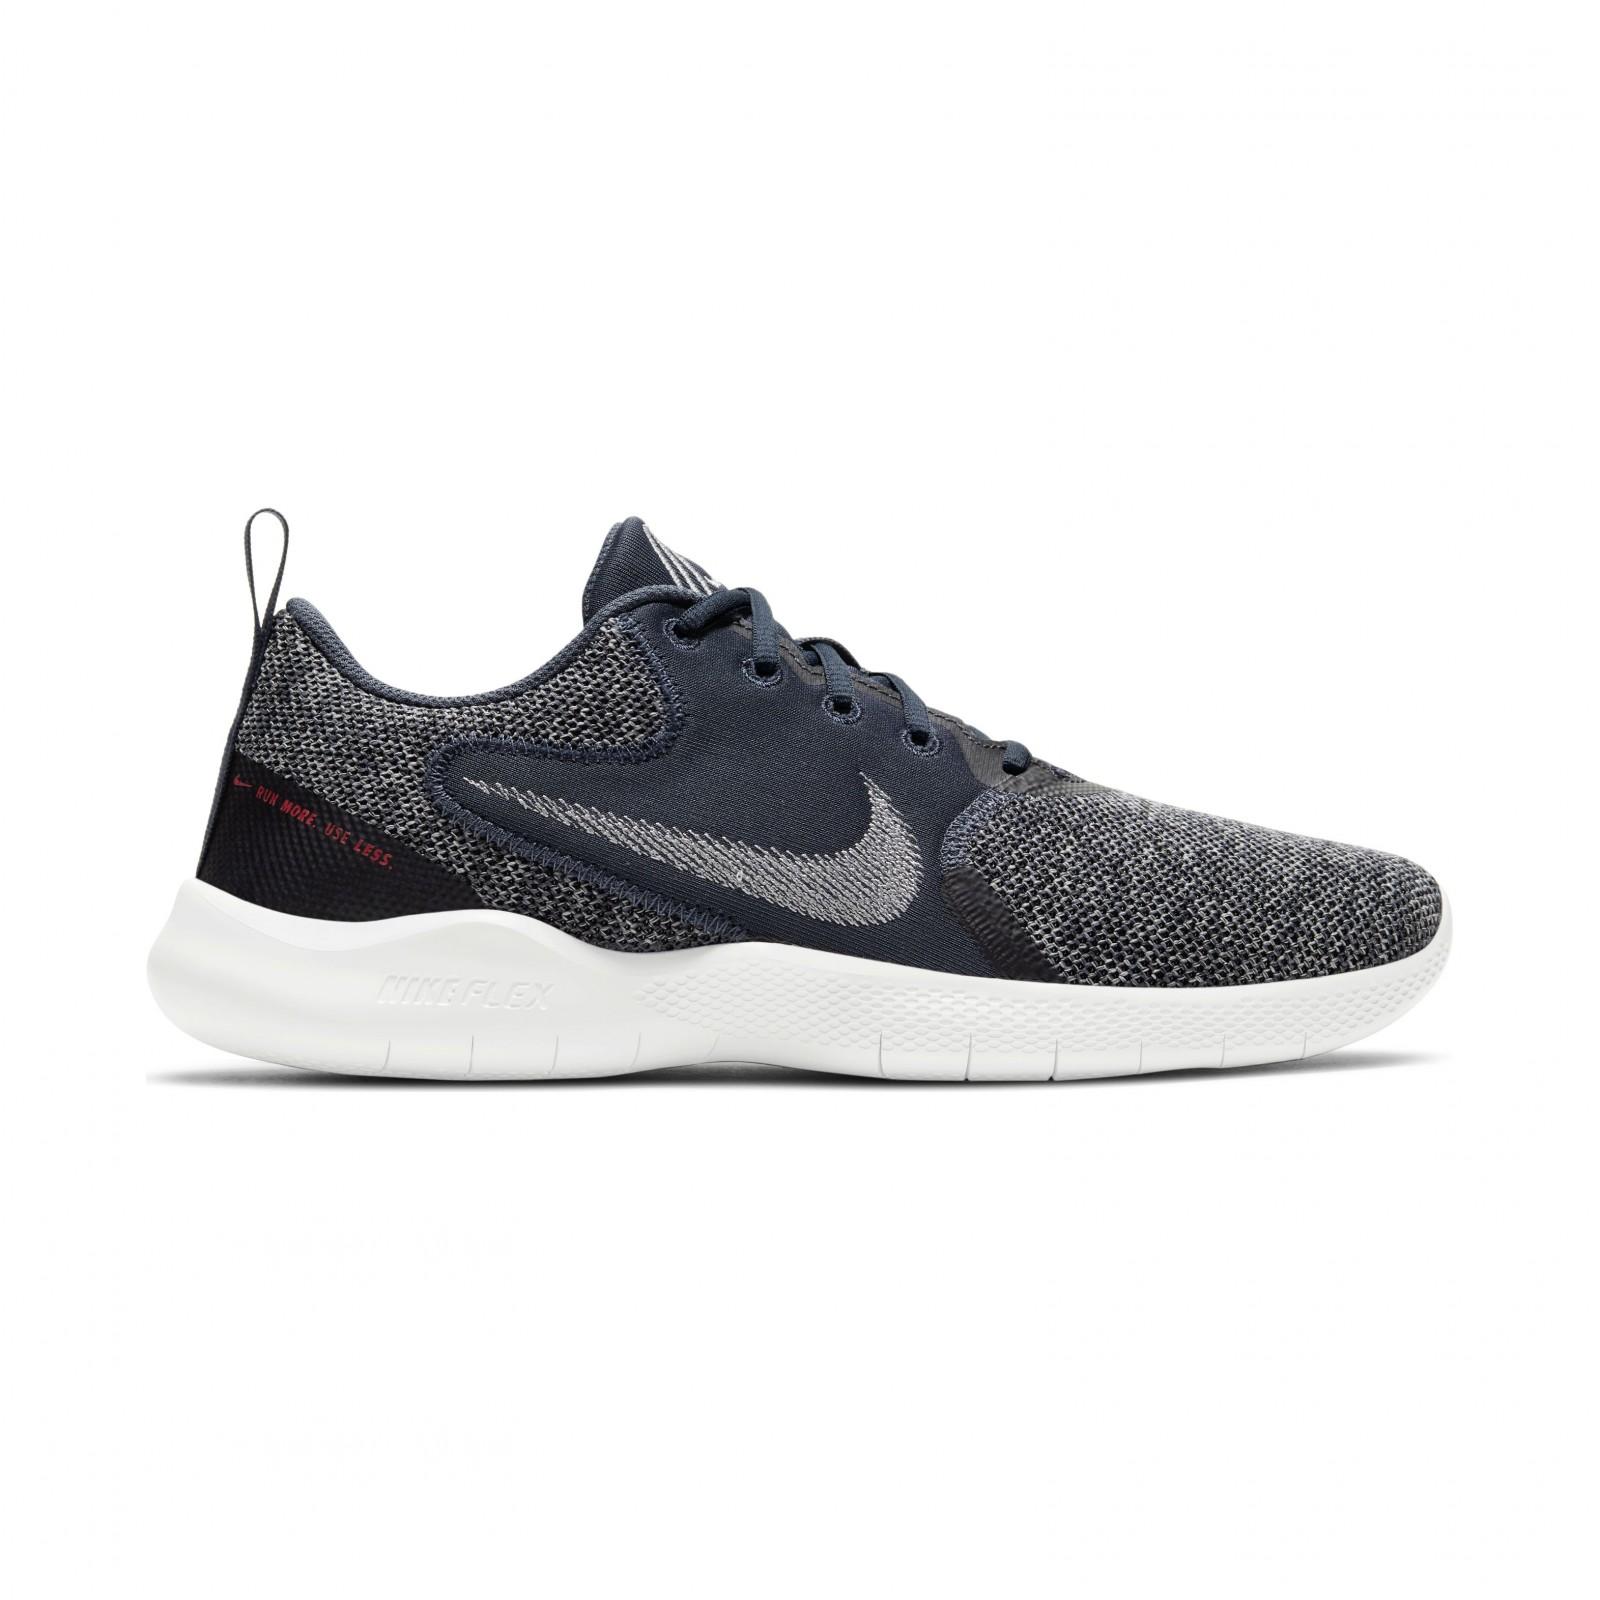 Nike Flex Experience Run 10 THUNDER BLUE/PURE PLATINUM-BLACK-WHITE